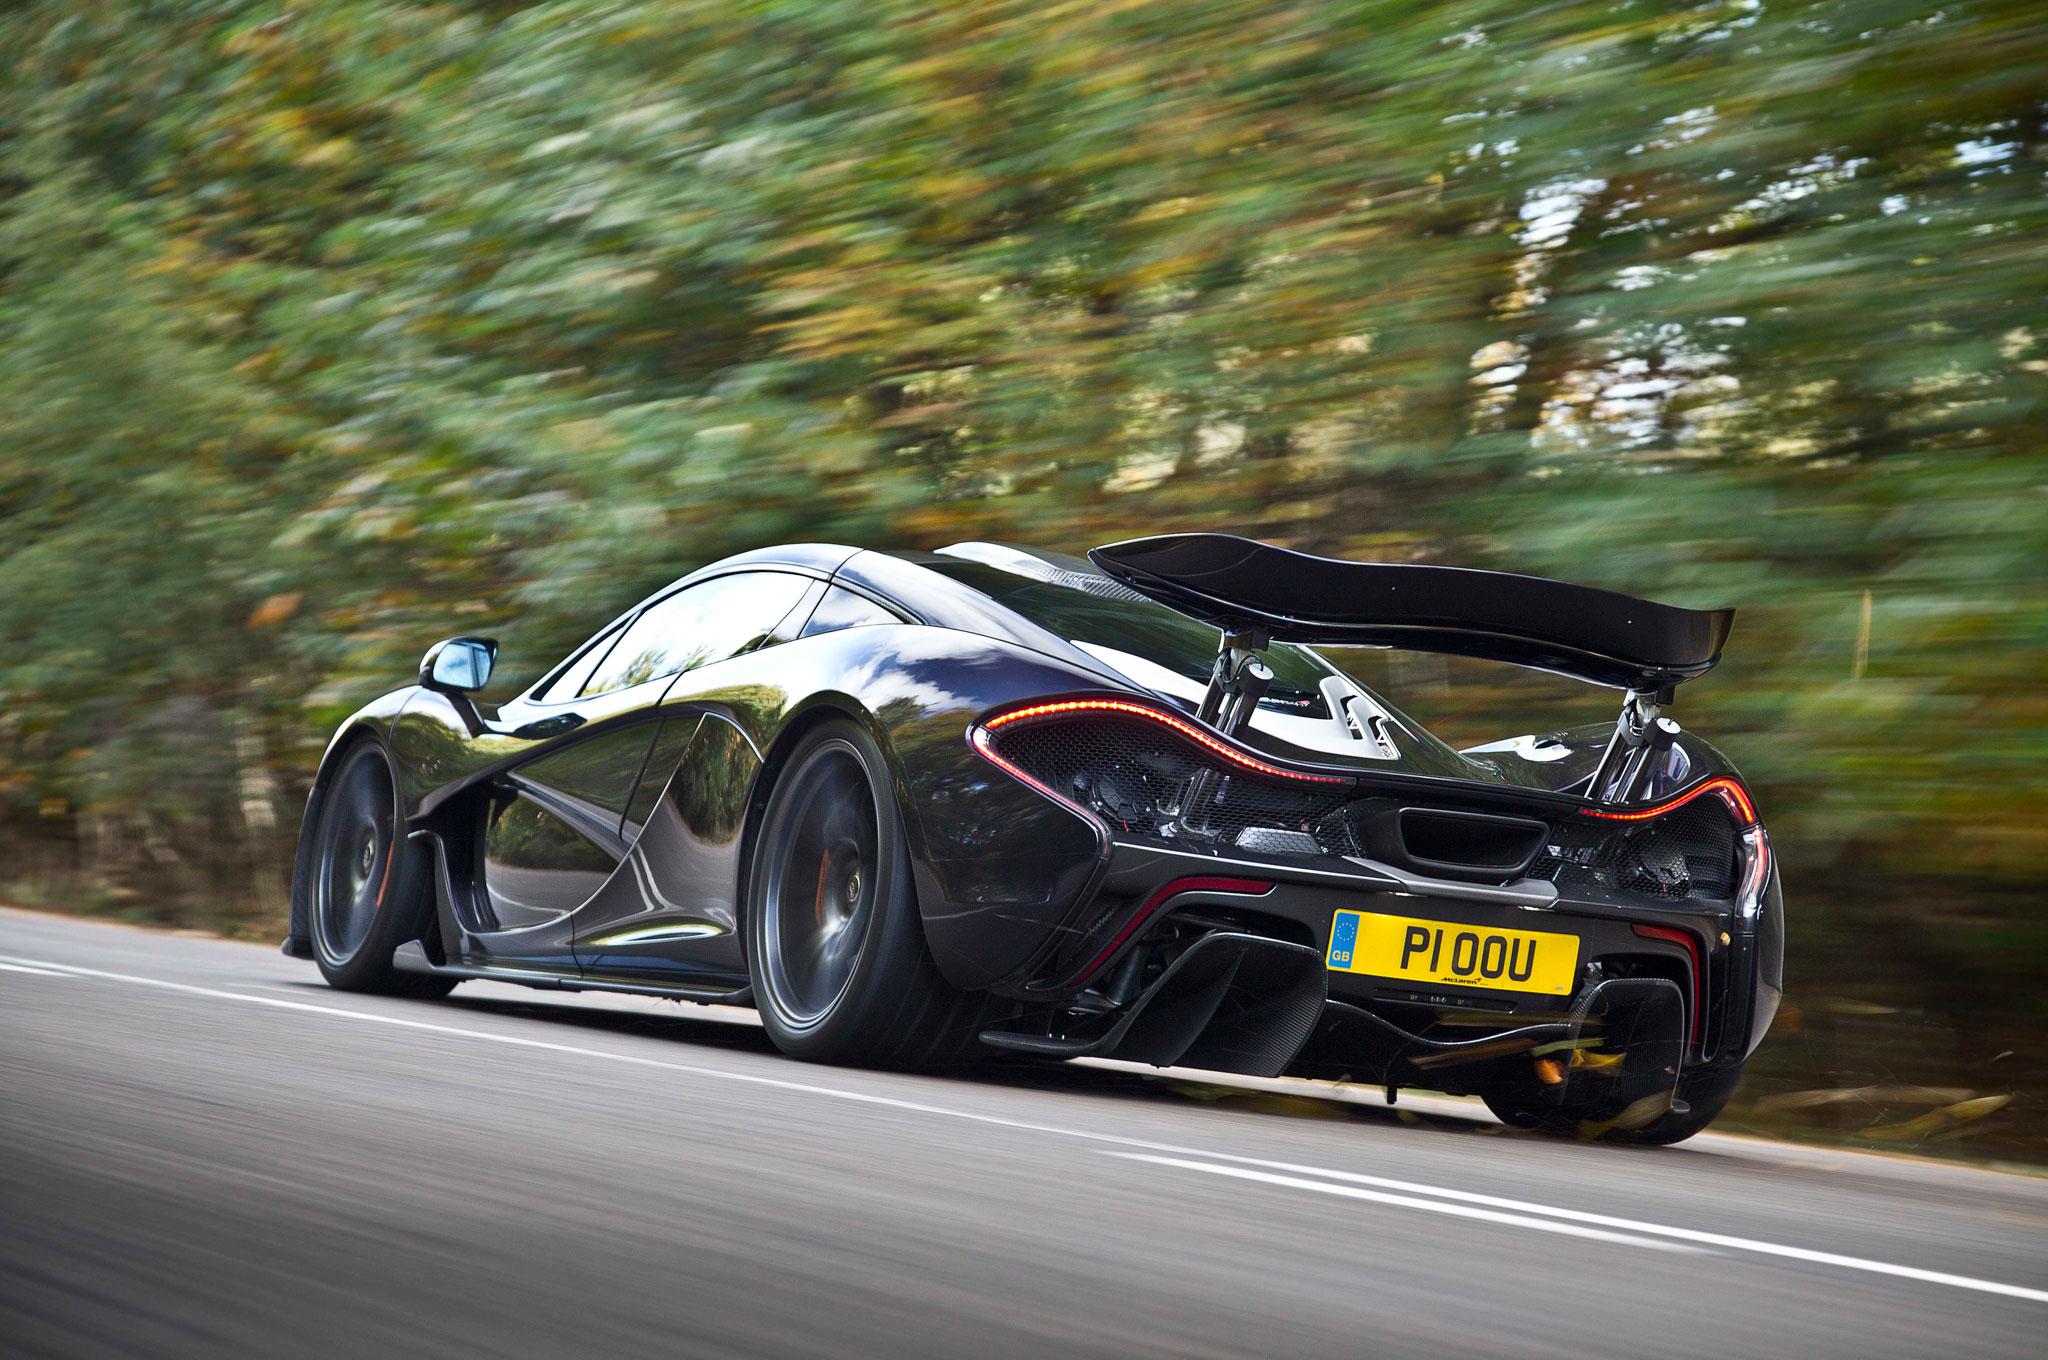 2014 Mclaren P1 - First Drive Review - Automobile Magazine